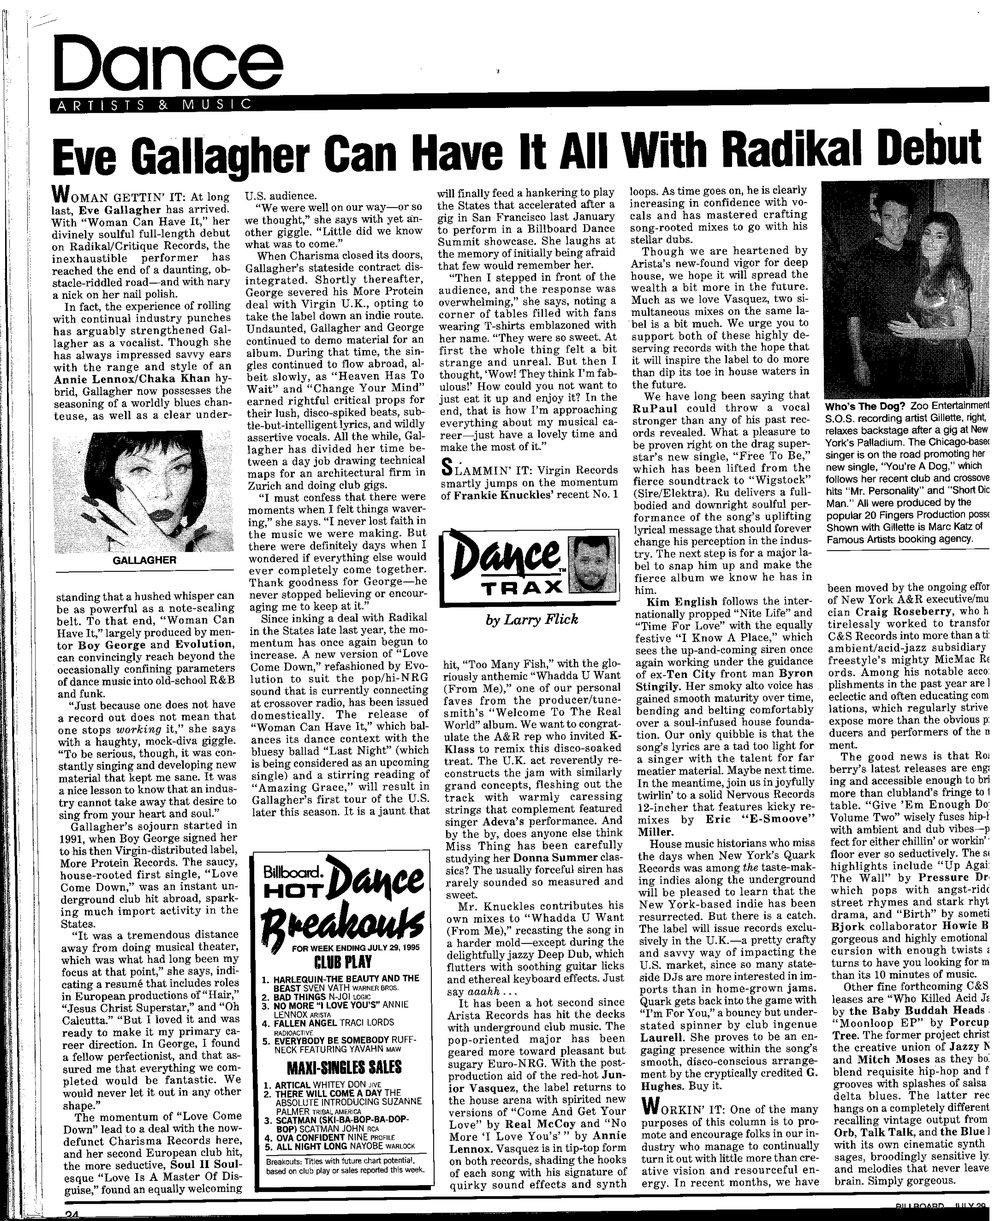 WLWLTDOO-1995-GILLETTE-BILLBOARD-YOD_PROMO_PHOTO-29JULY1995.jpg